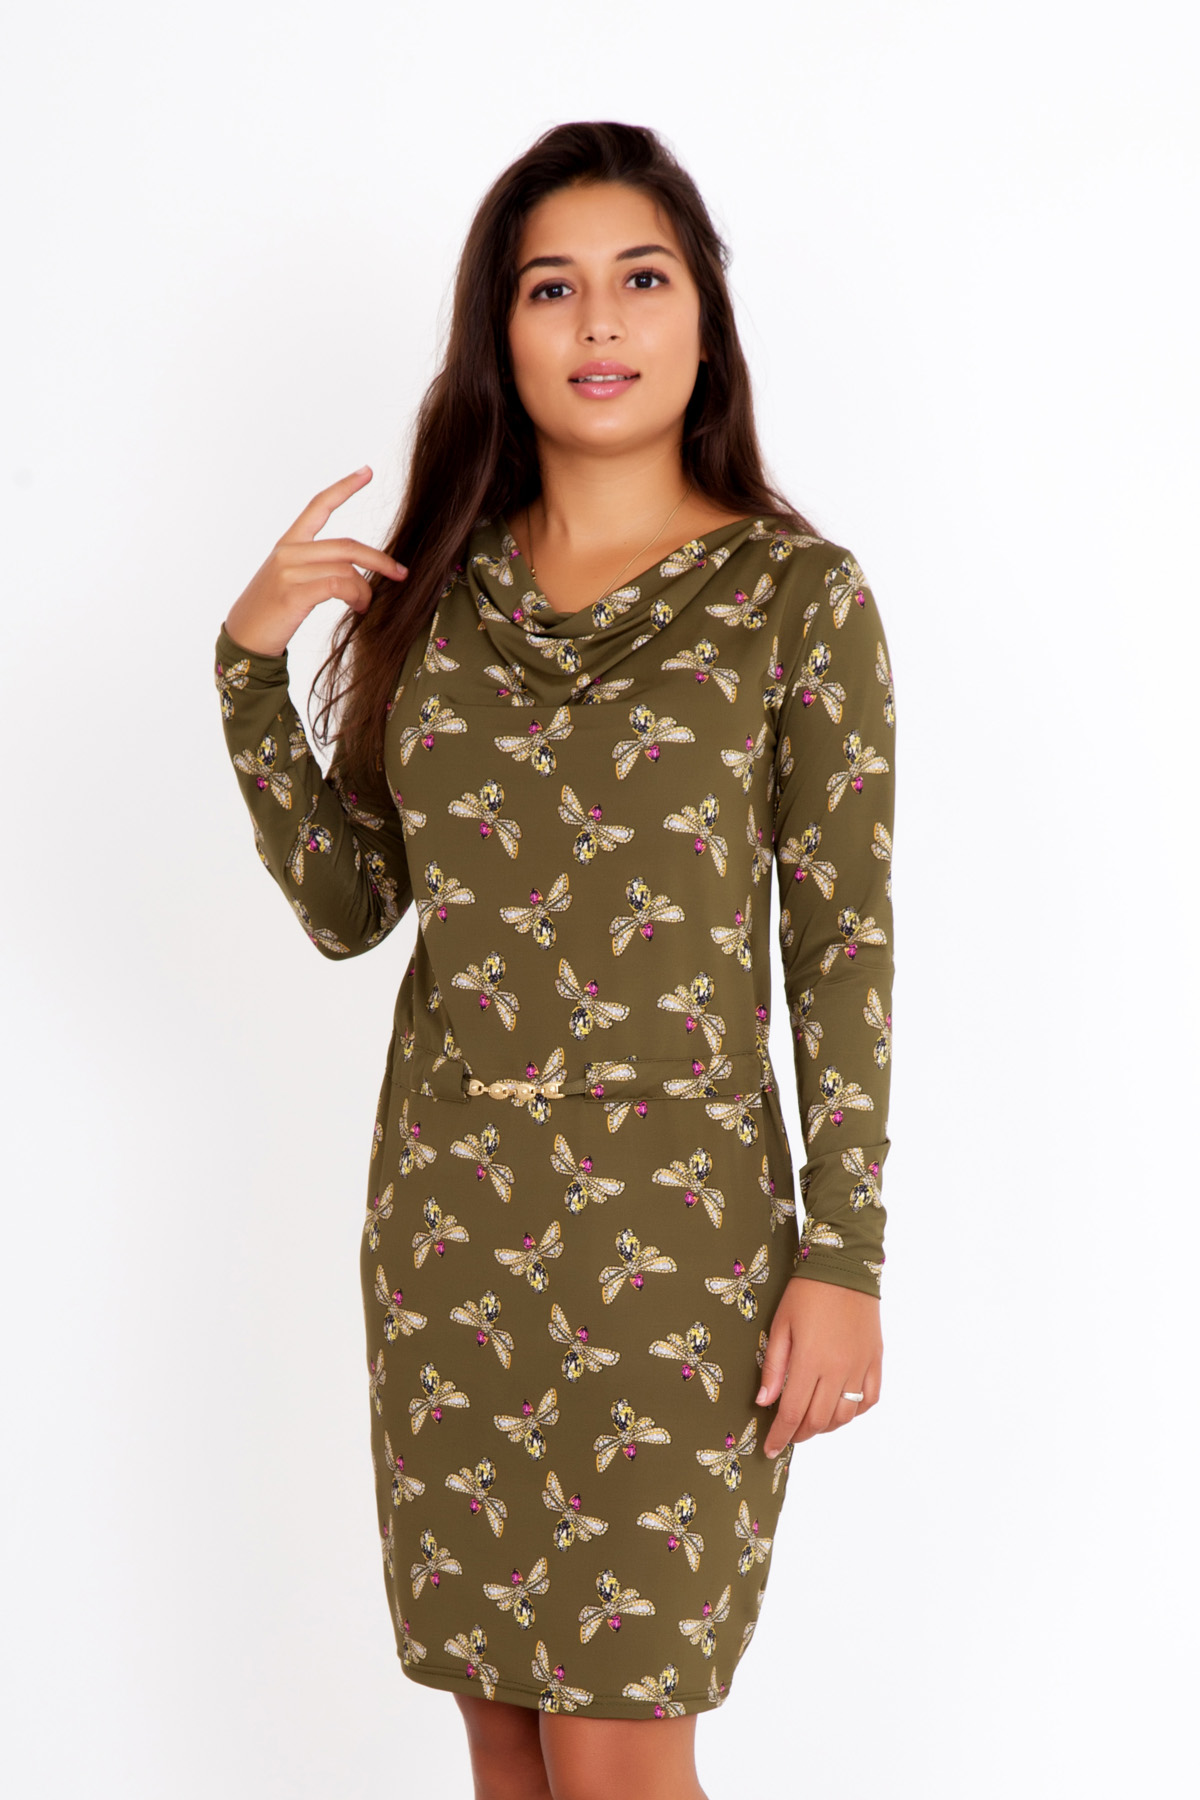 Жен. платье Стрекоза р. 54Платья, туники<br>Обхват груди:108 см<br>Обхват талии:88 см<br>Обхват бедер:116 см<br>Длина по спинке:95 см<br>Рост:167 см<br><br>Тип: Жен. платье<br>Размер: 54<br>Материал: Масло